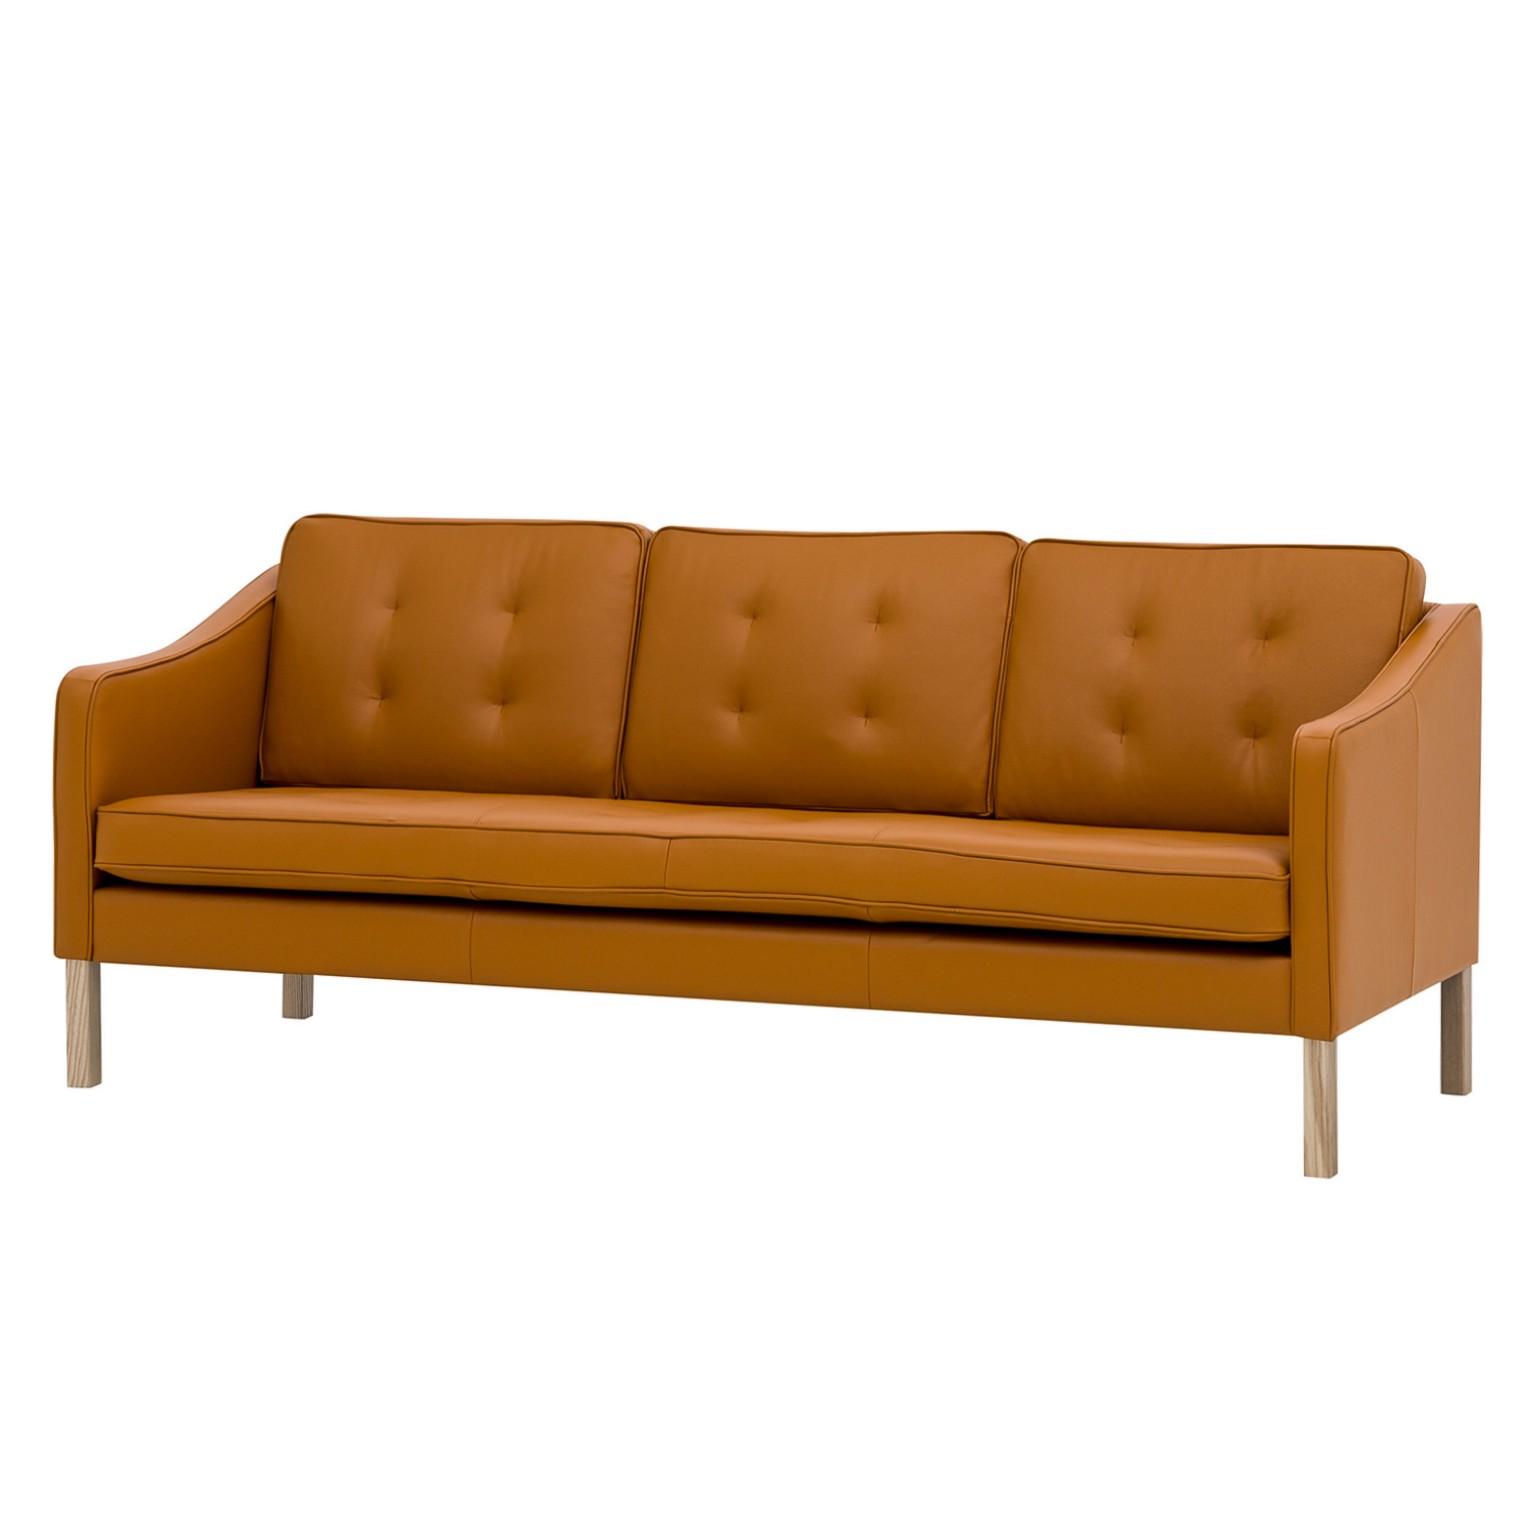 Sofa Risor (3-Sitzer) Echtleder - Echtleder Neka Cognac